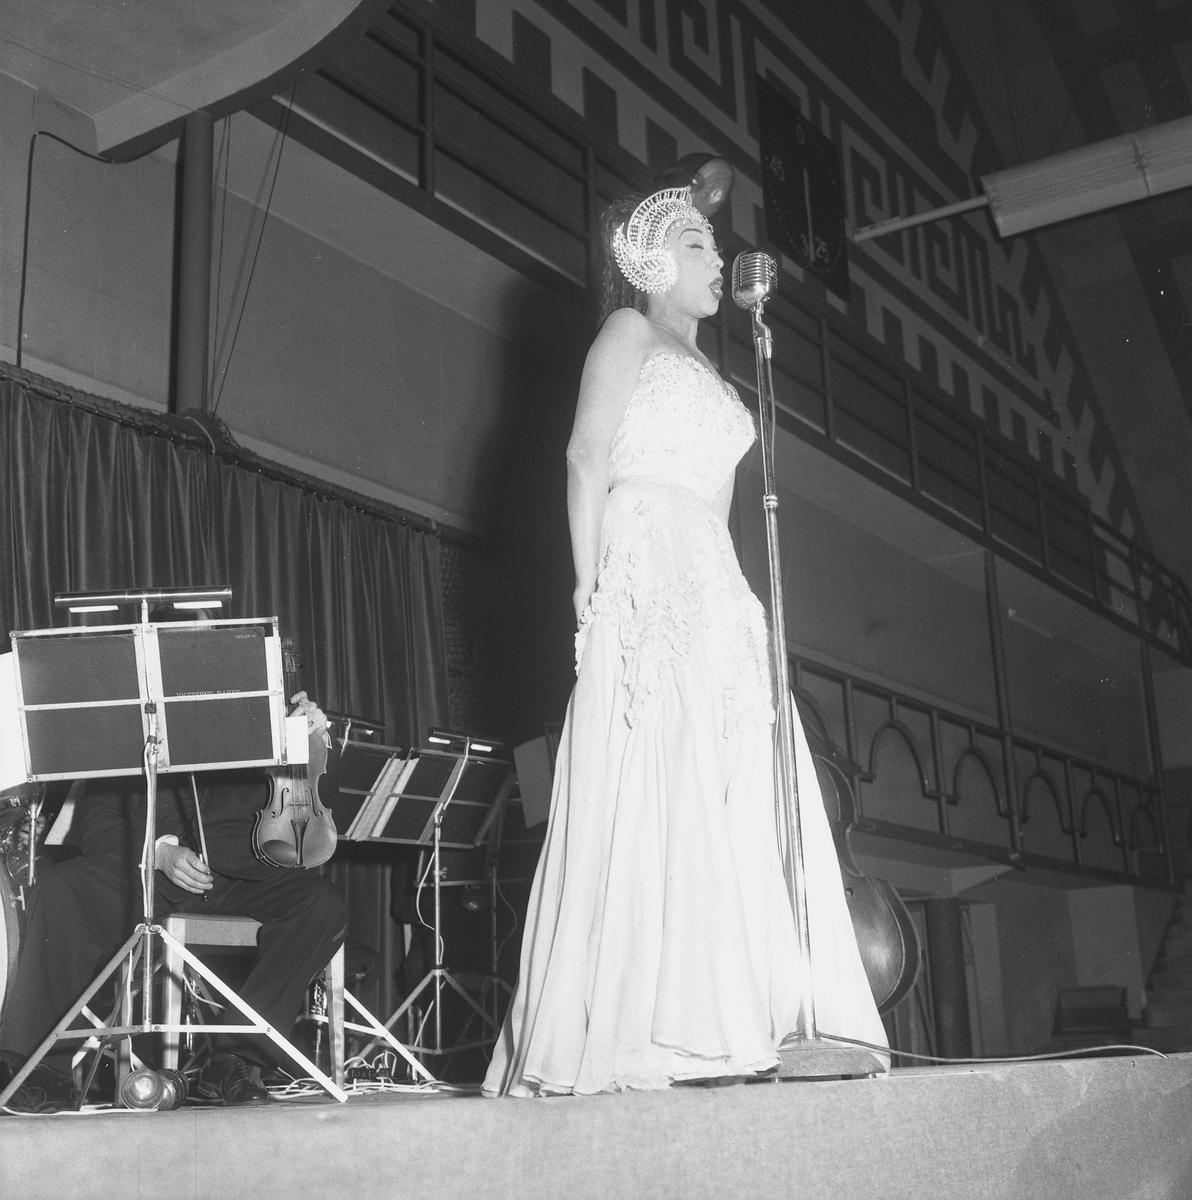 Josephine Baker. Mars 1956. - Örebro läns museum / DigitaltMuseum